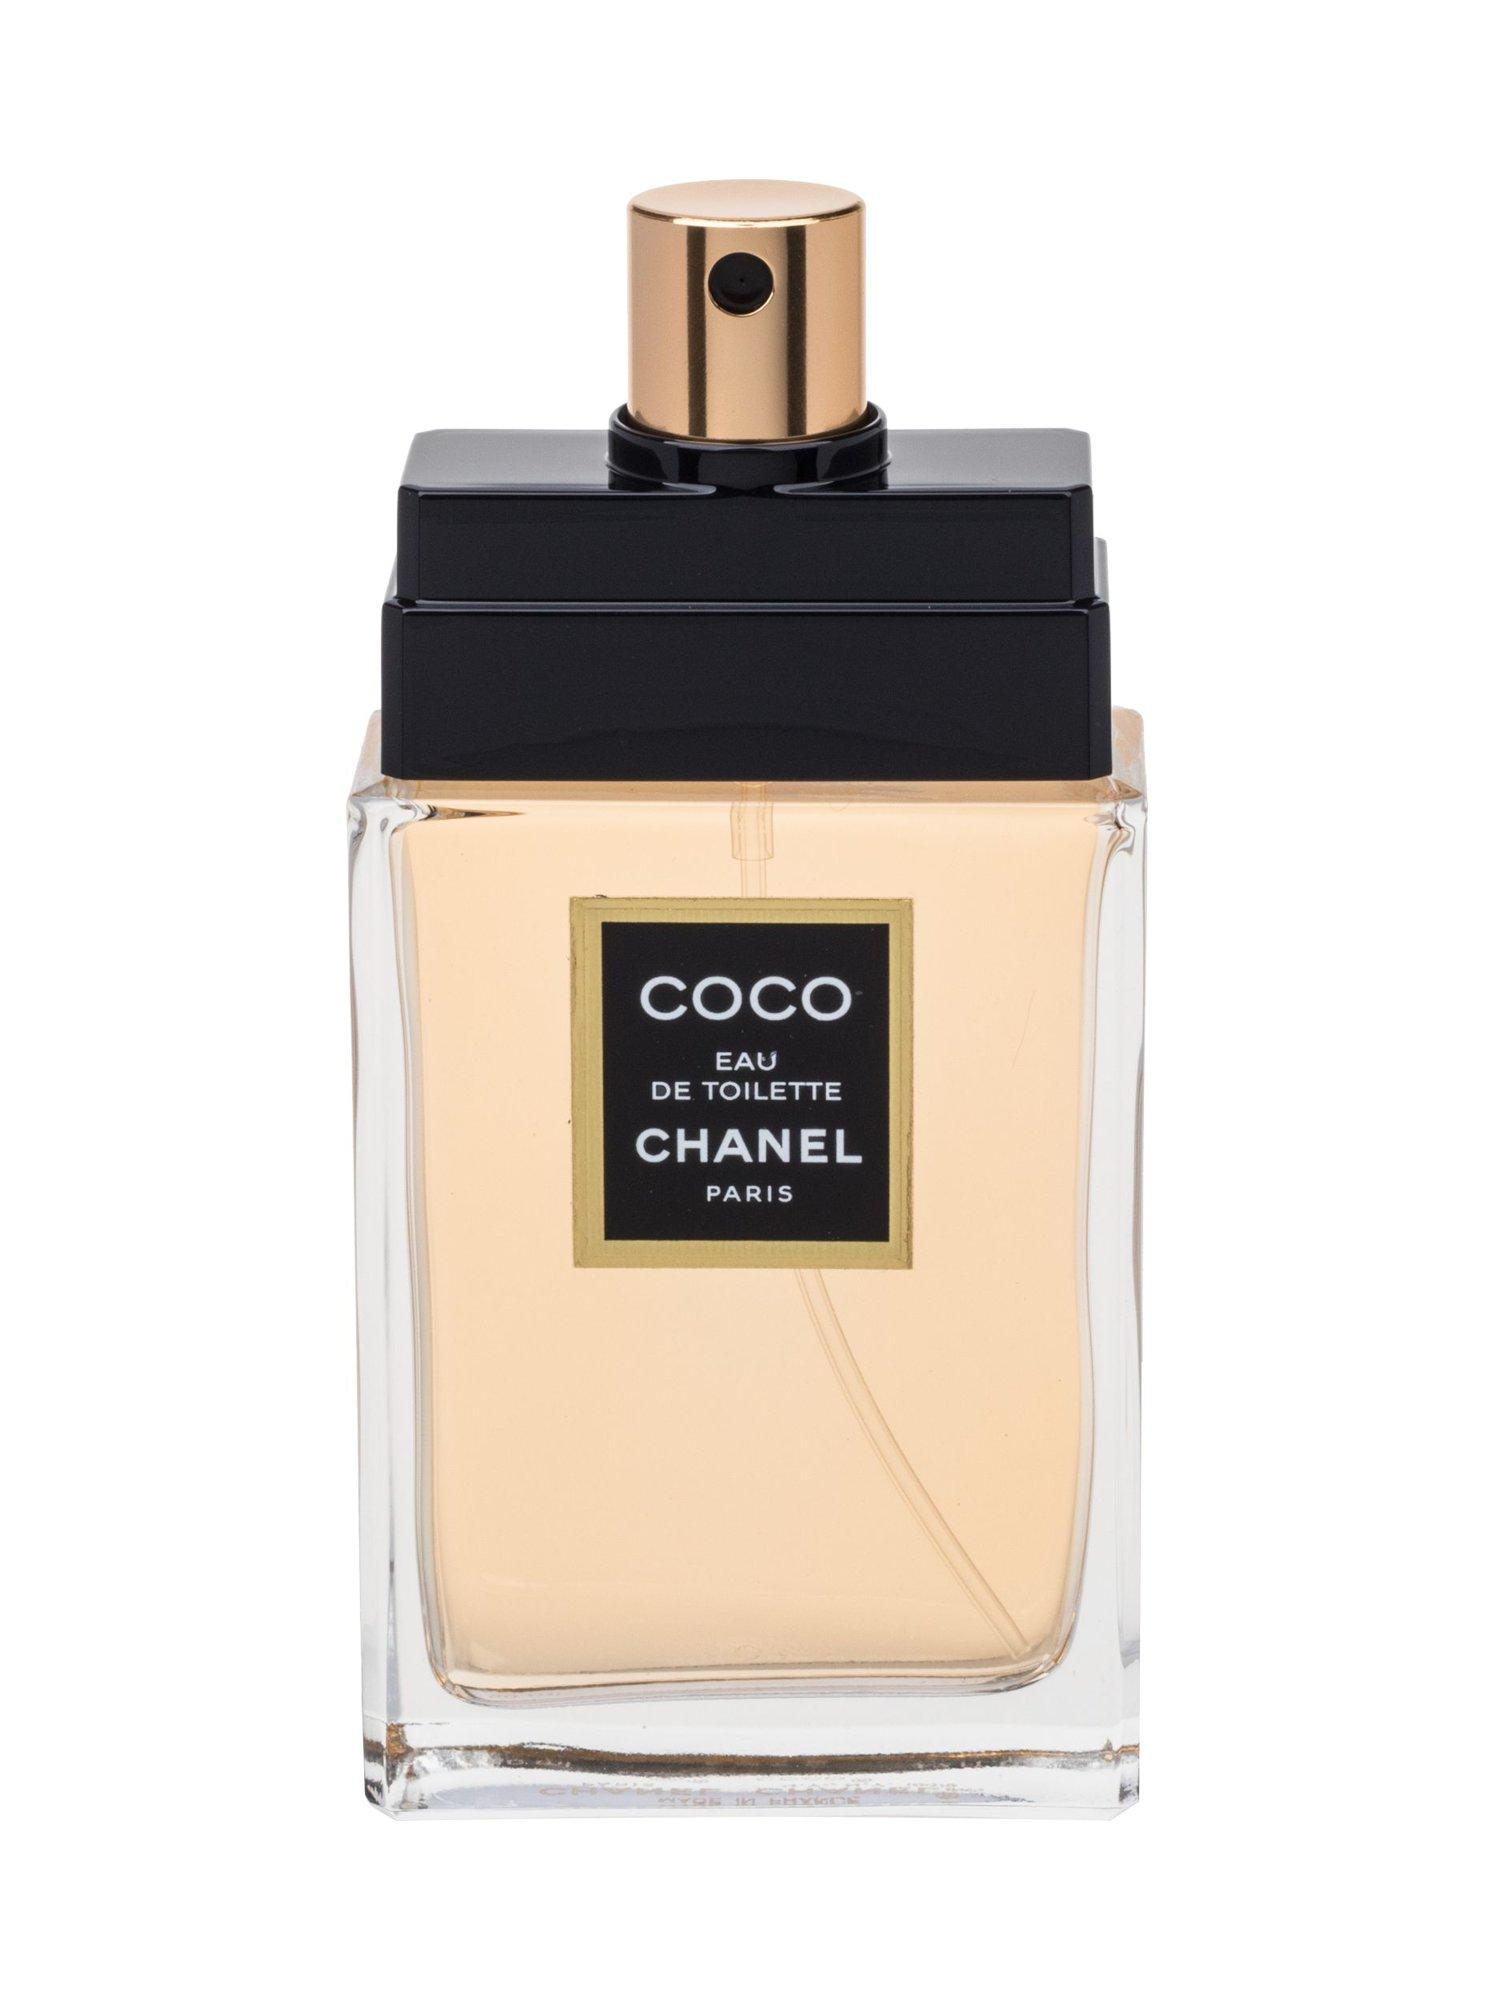 Chanel Coco EDT 50ml